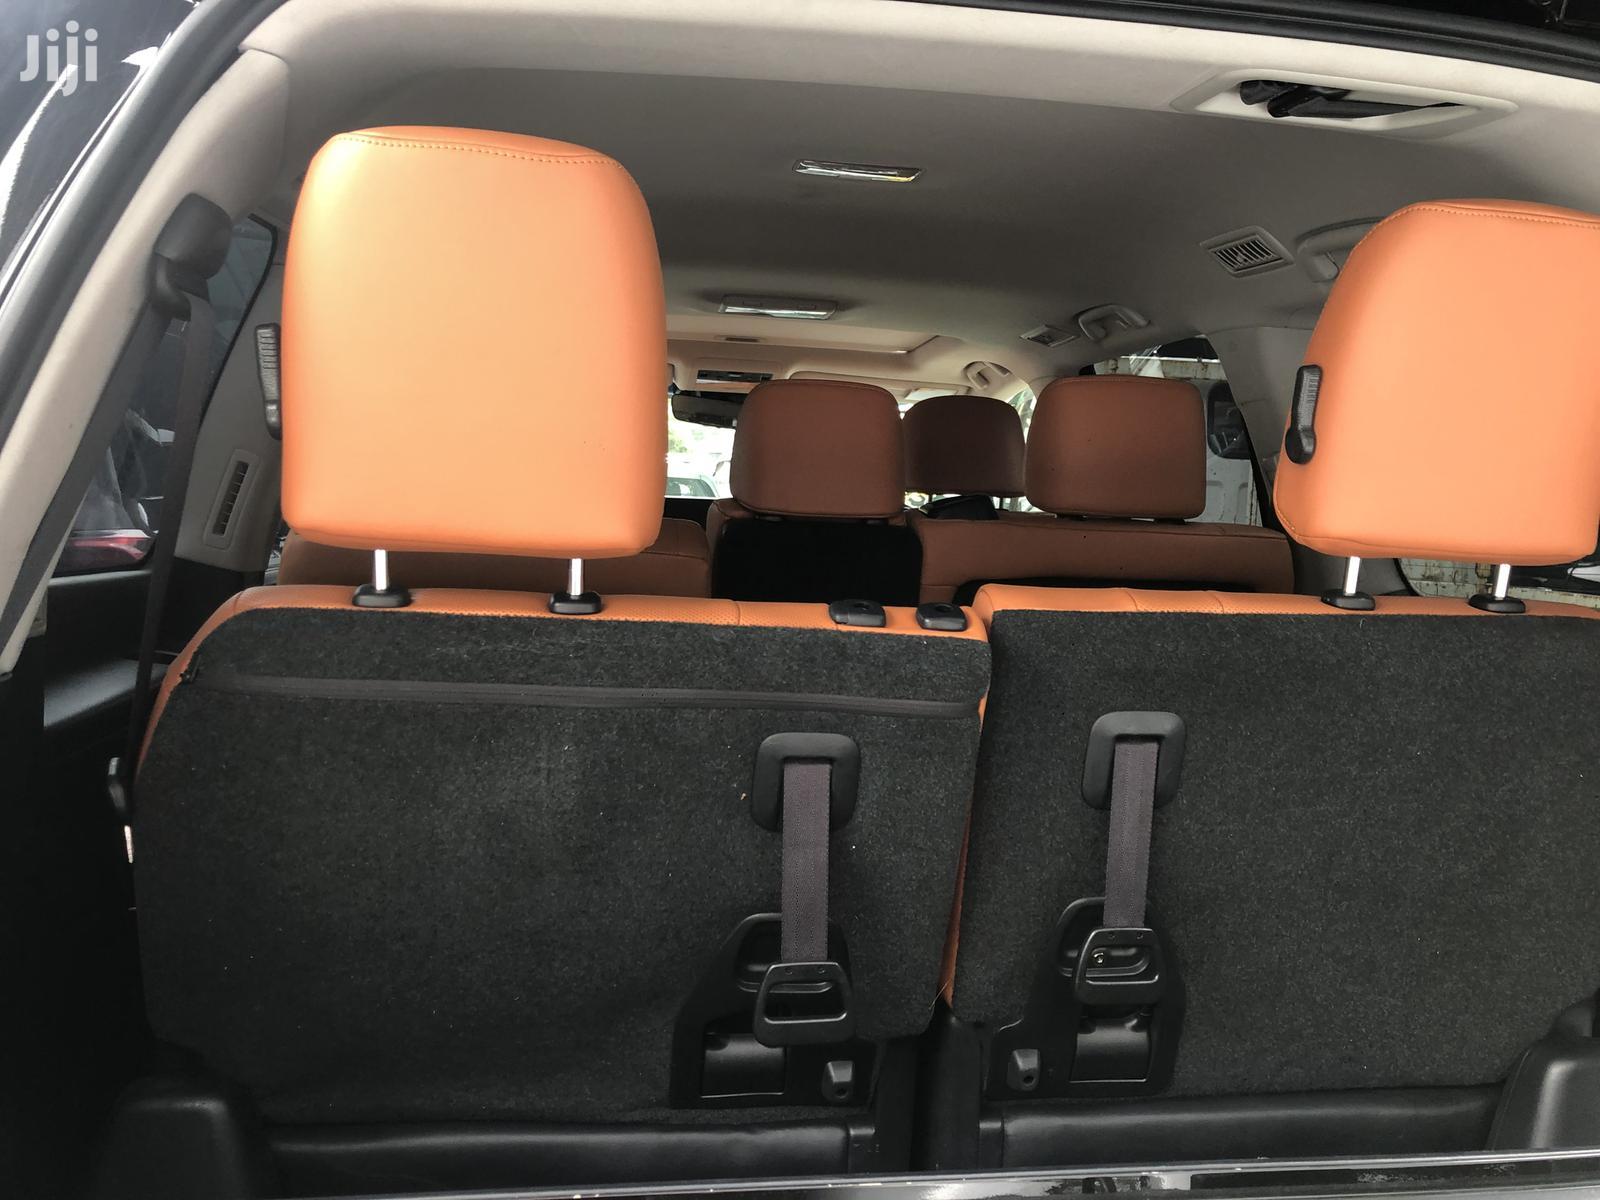 Lexus LX 570 2015 Base Black | Cars for sale in Kilimani, Nairobi, Kenya